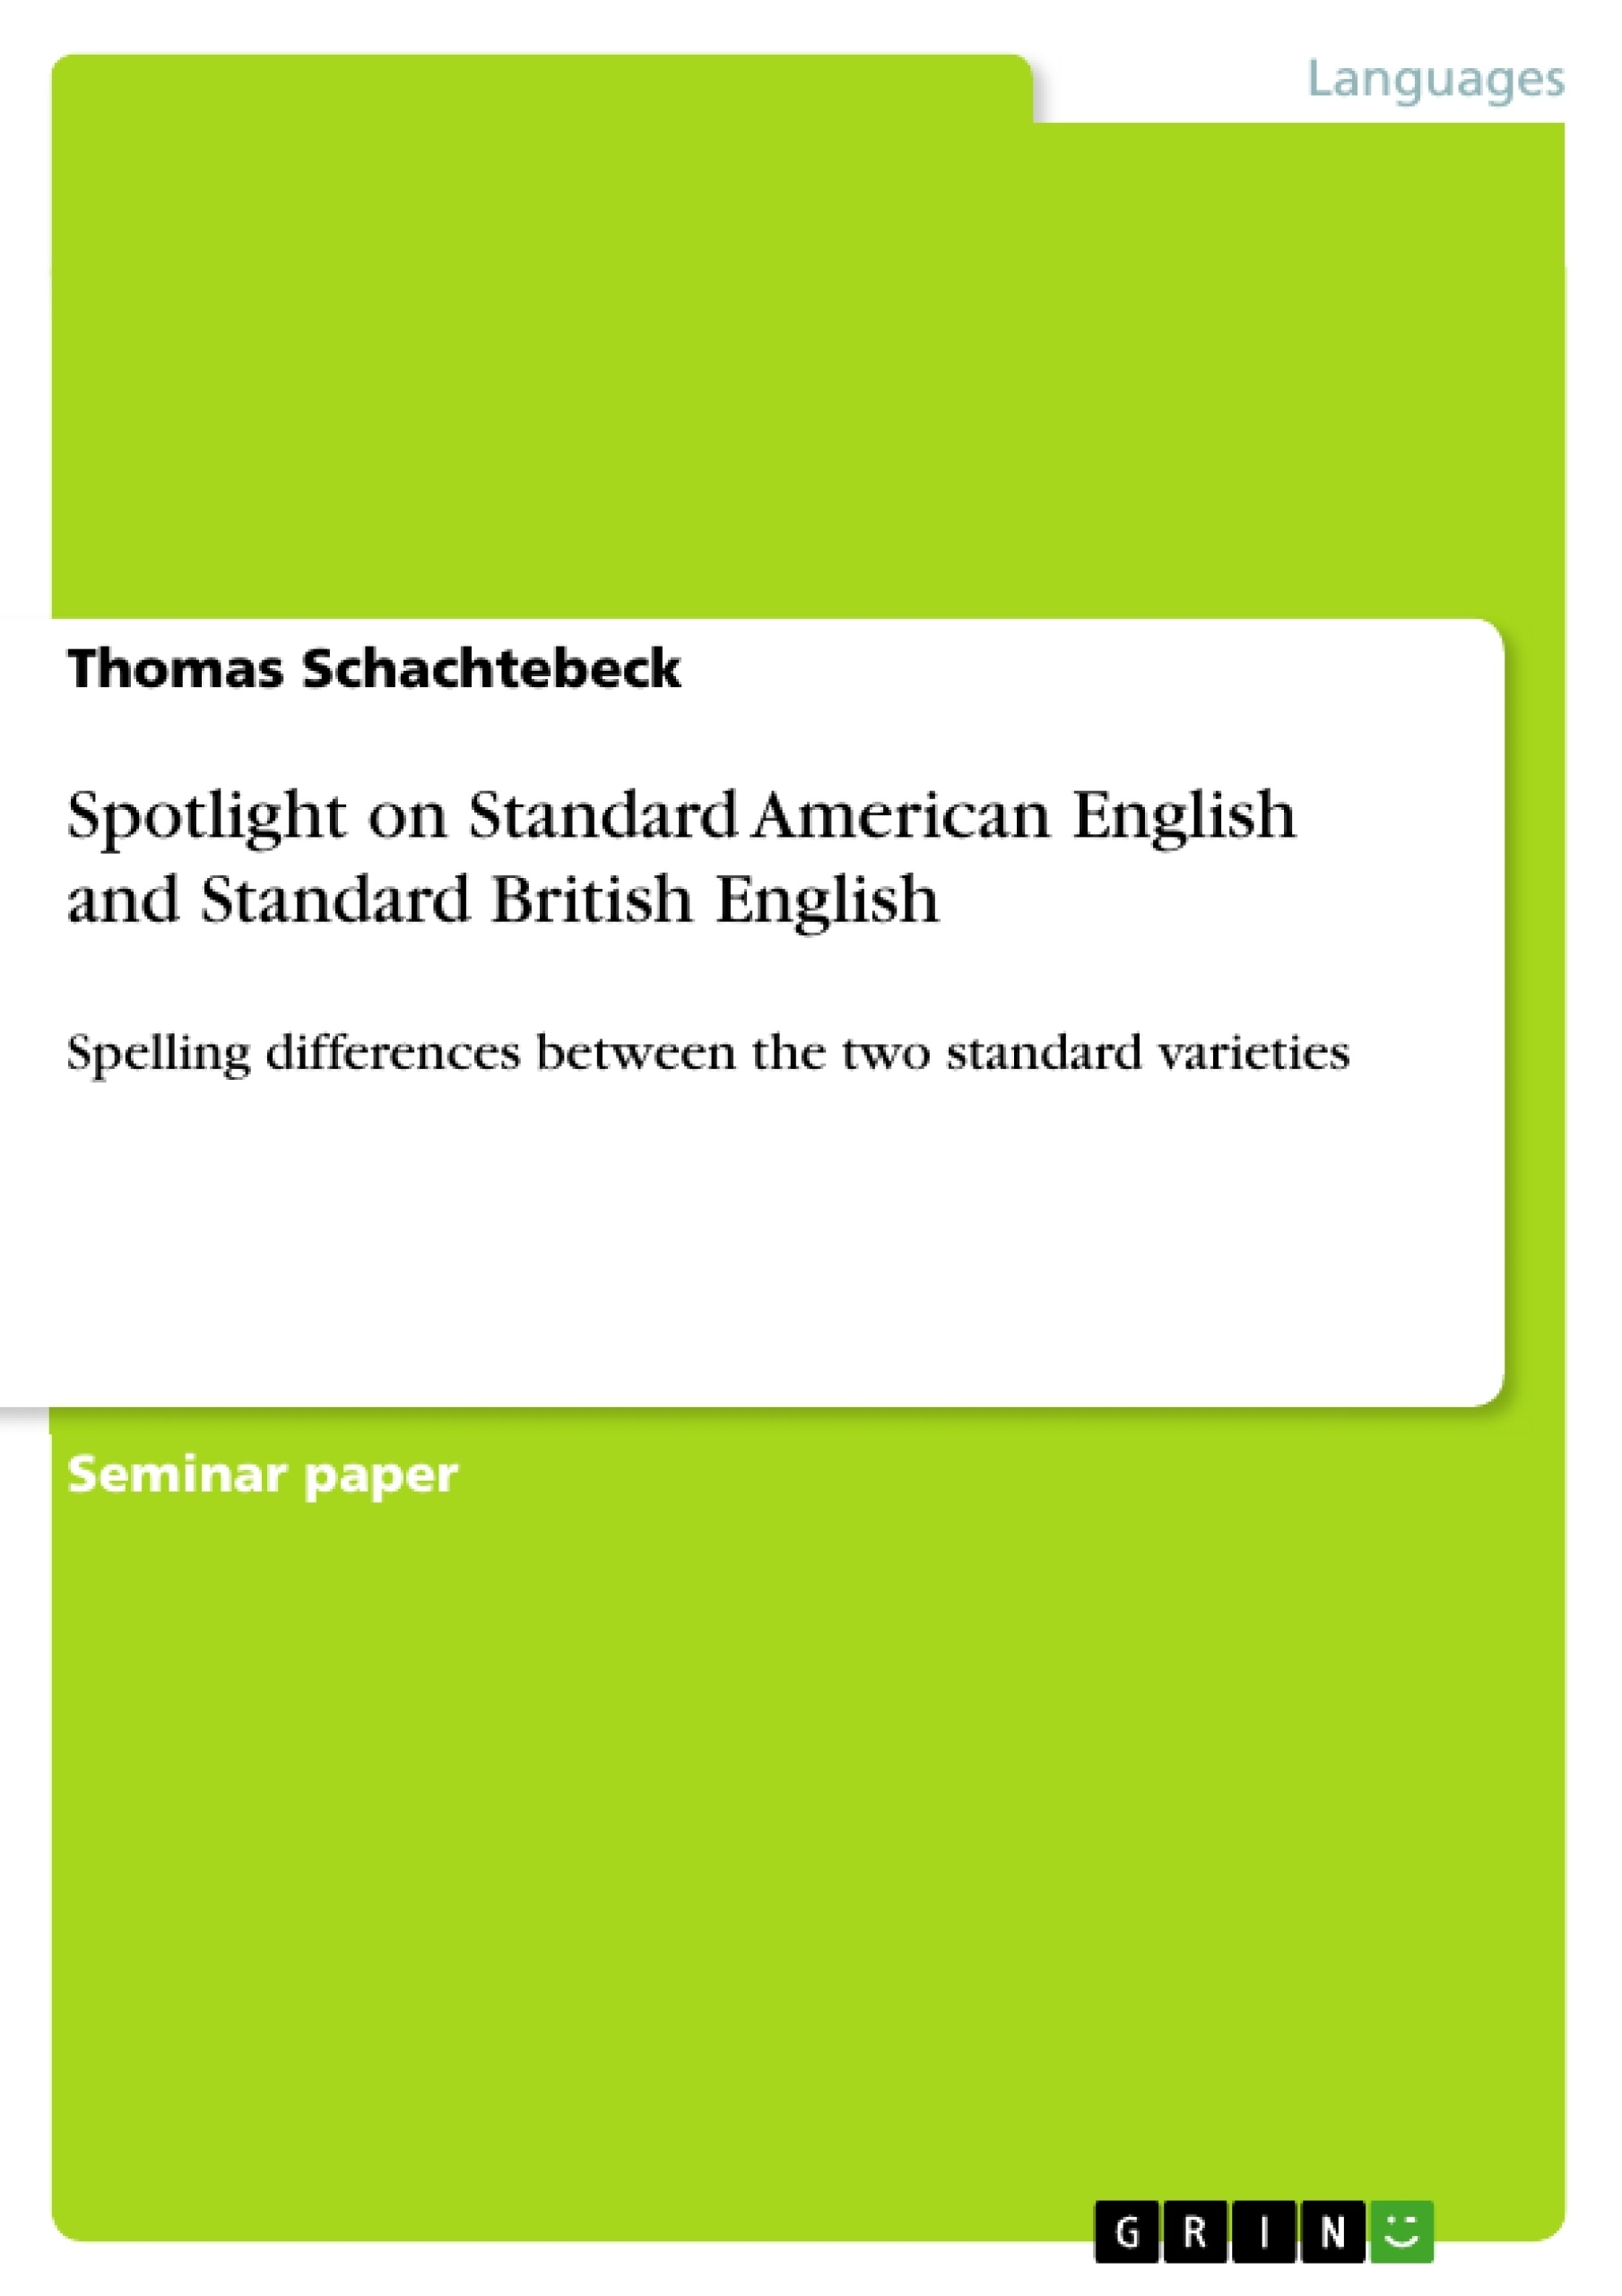 Title: Spotlight on Standard American English and Standard British English